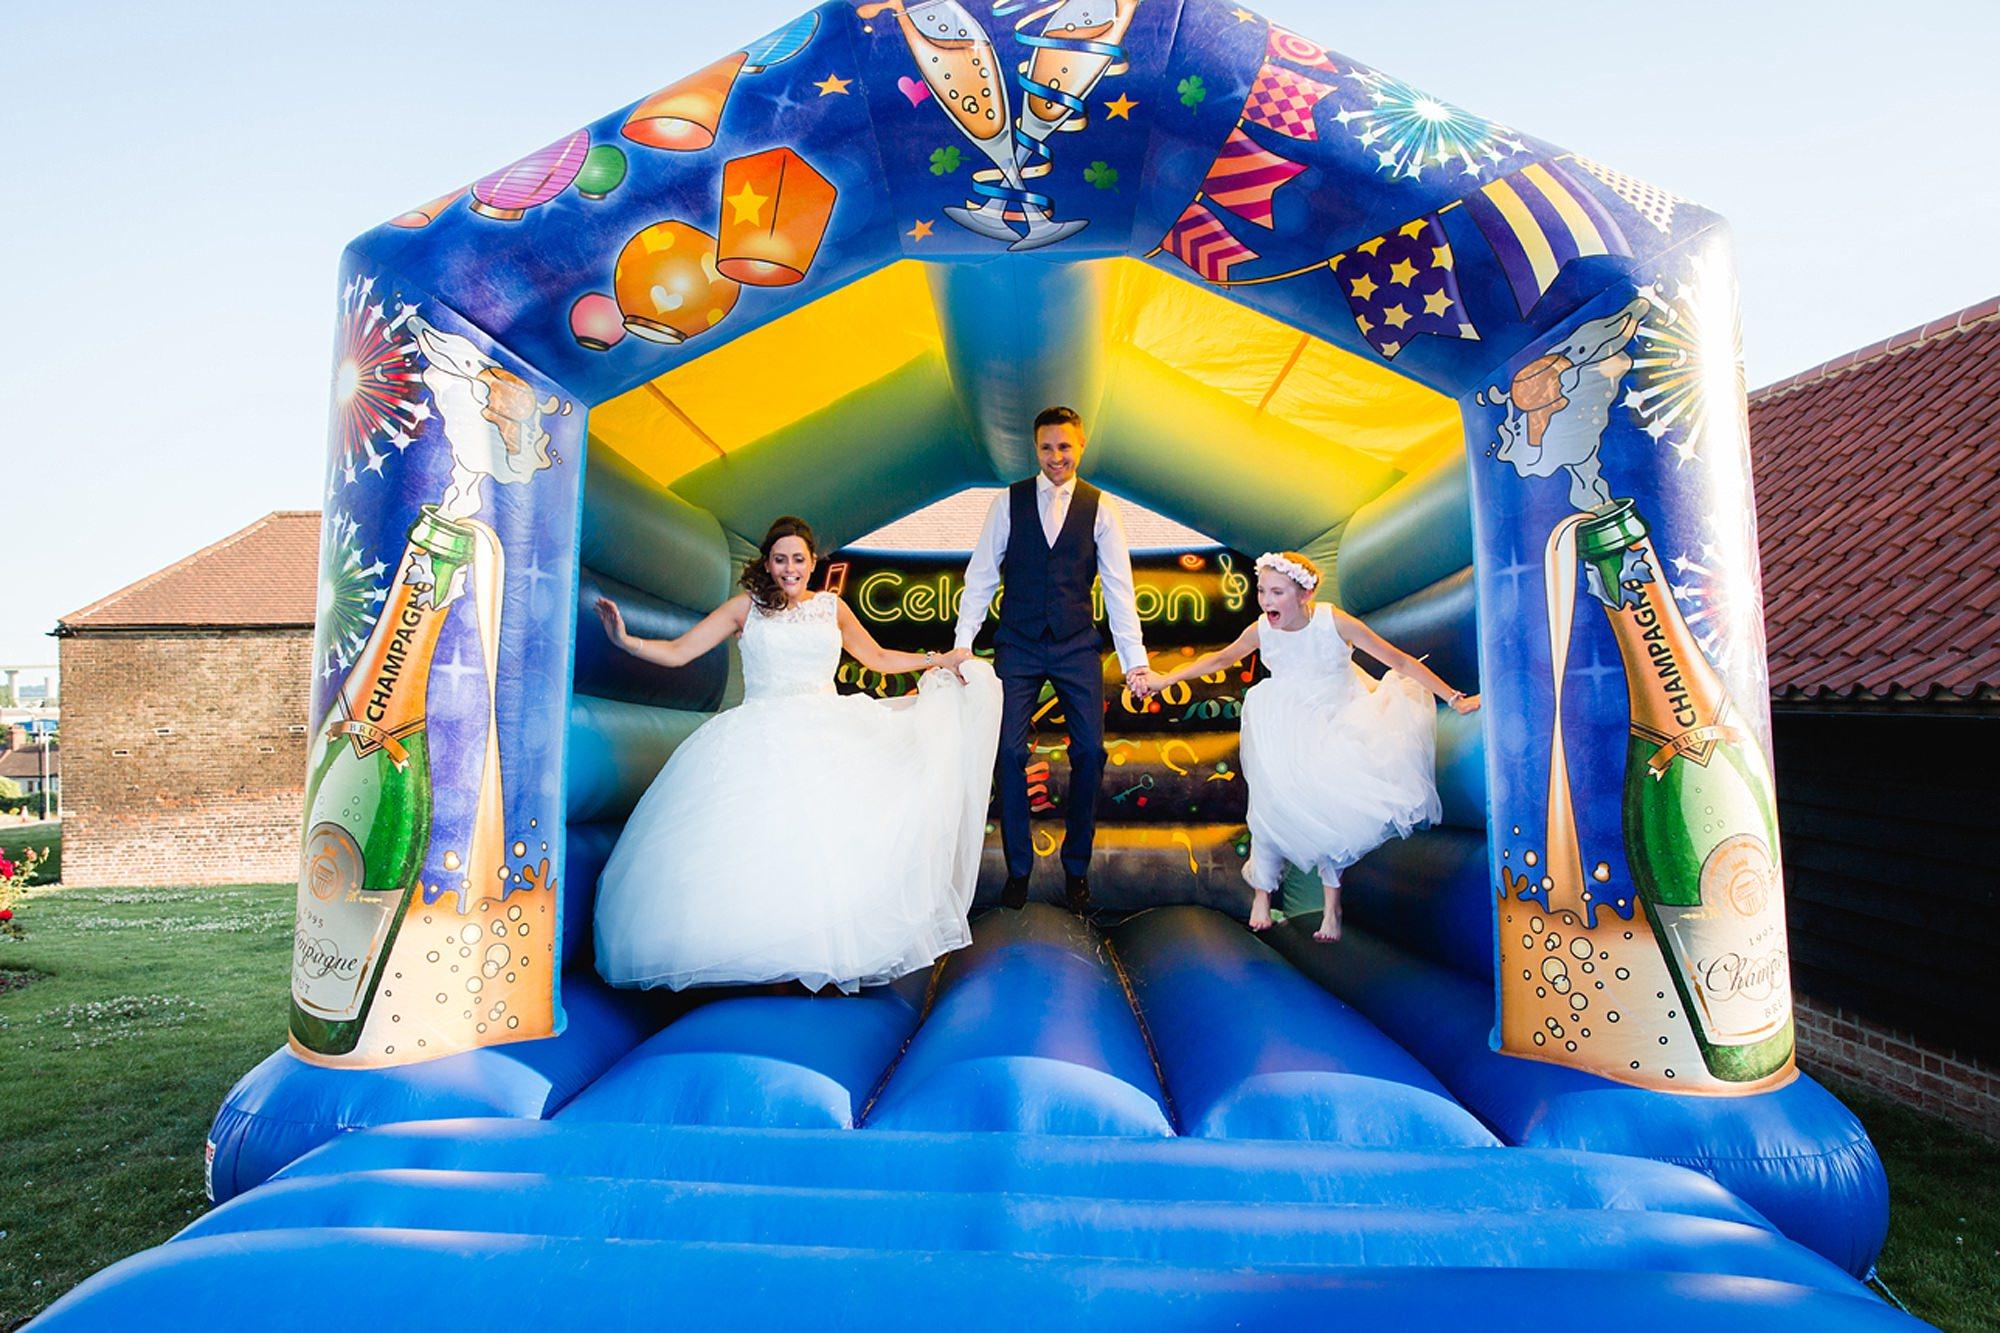 High House barns wedding photography bride and groom on bouncy castle